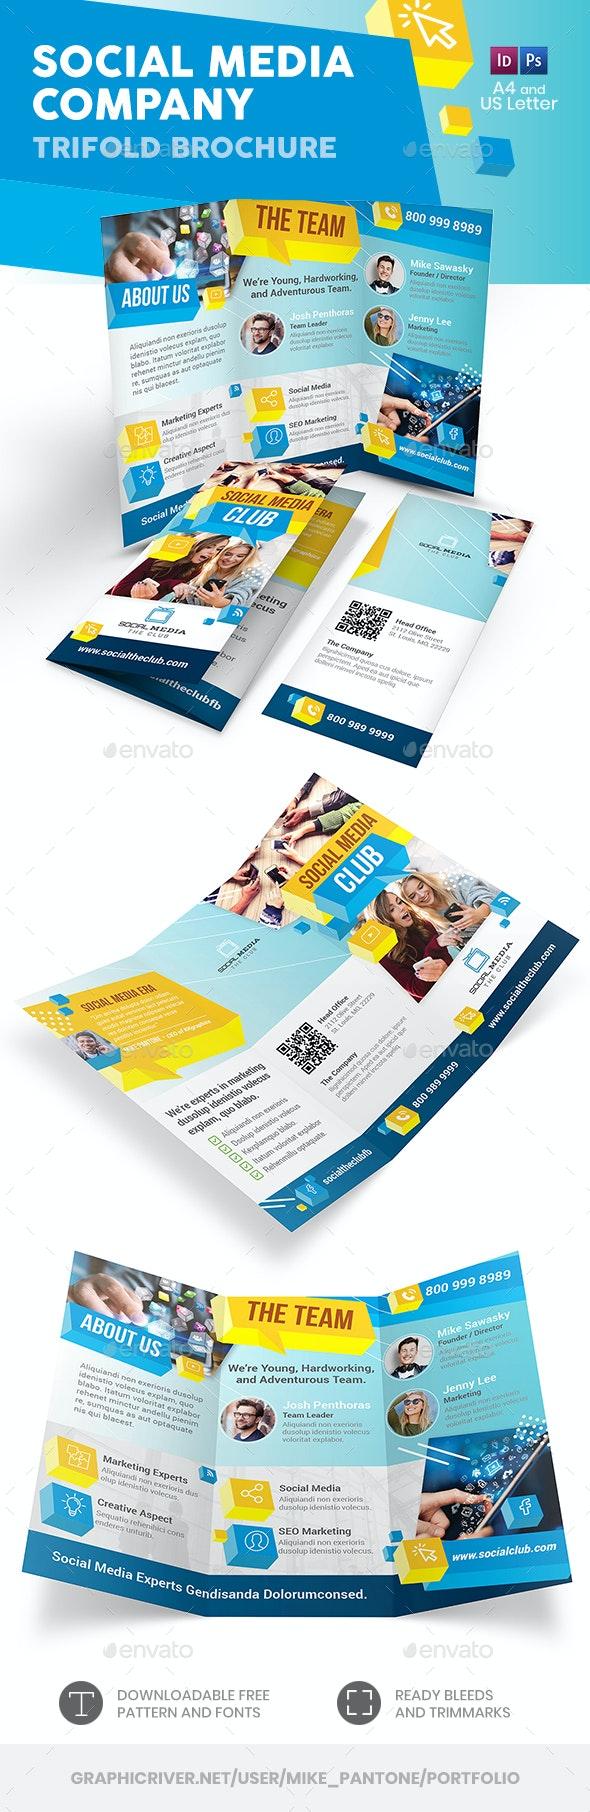 Social Media Company Trifold Brochure - Informational Brochures